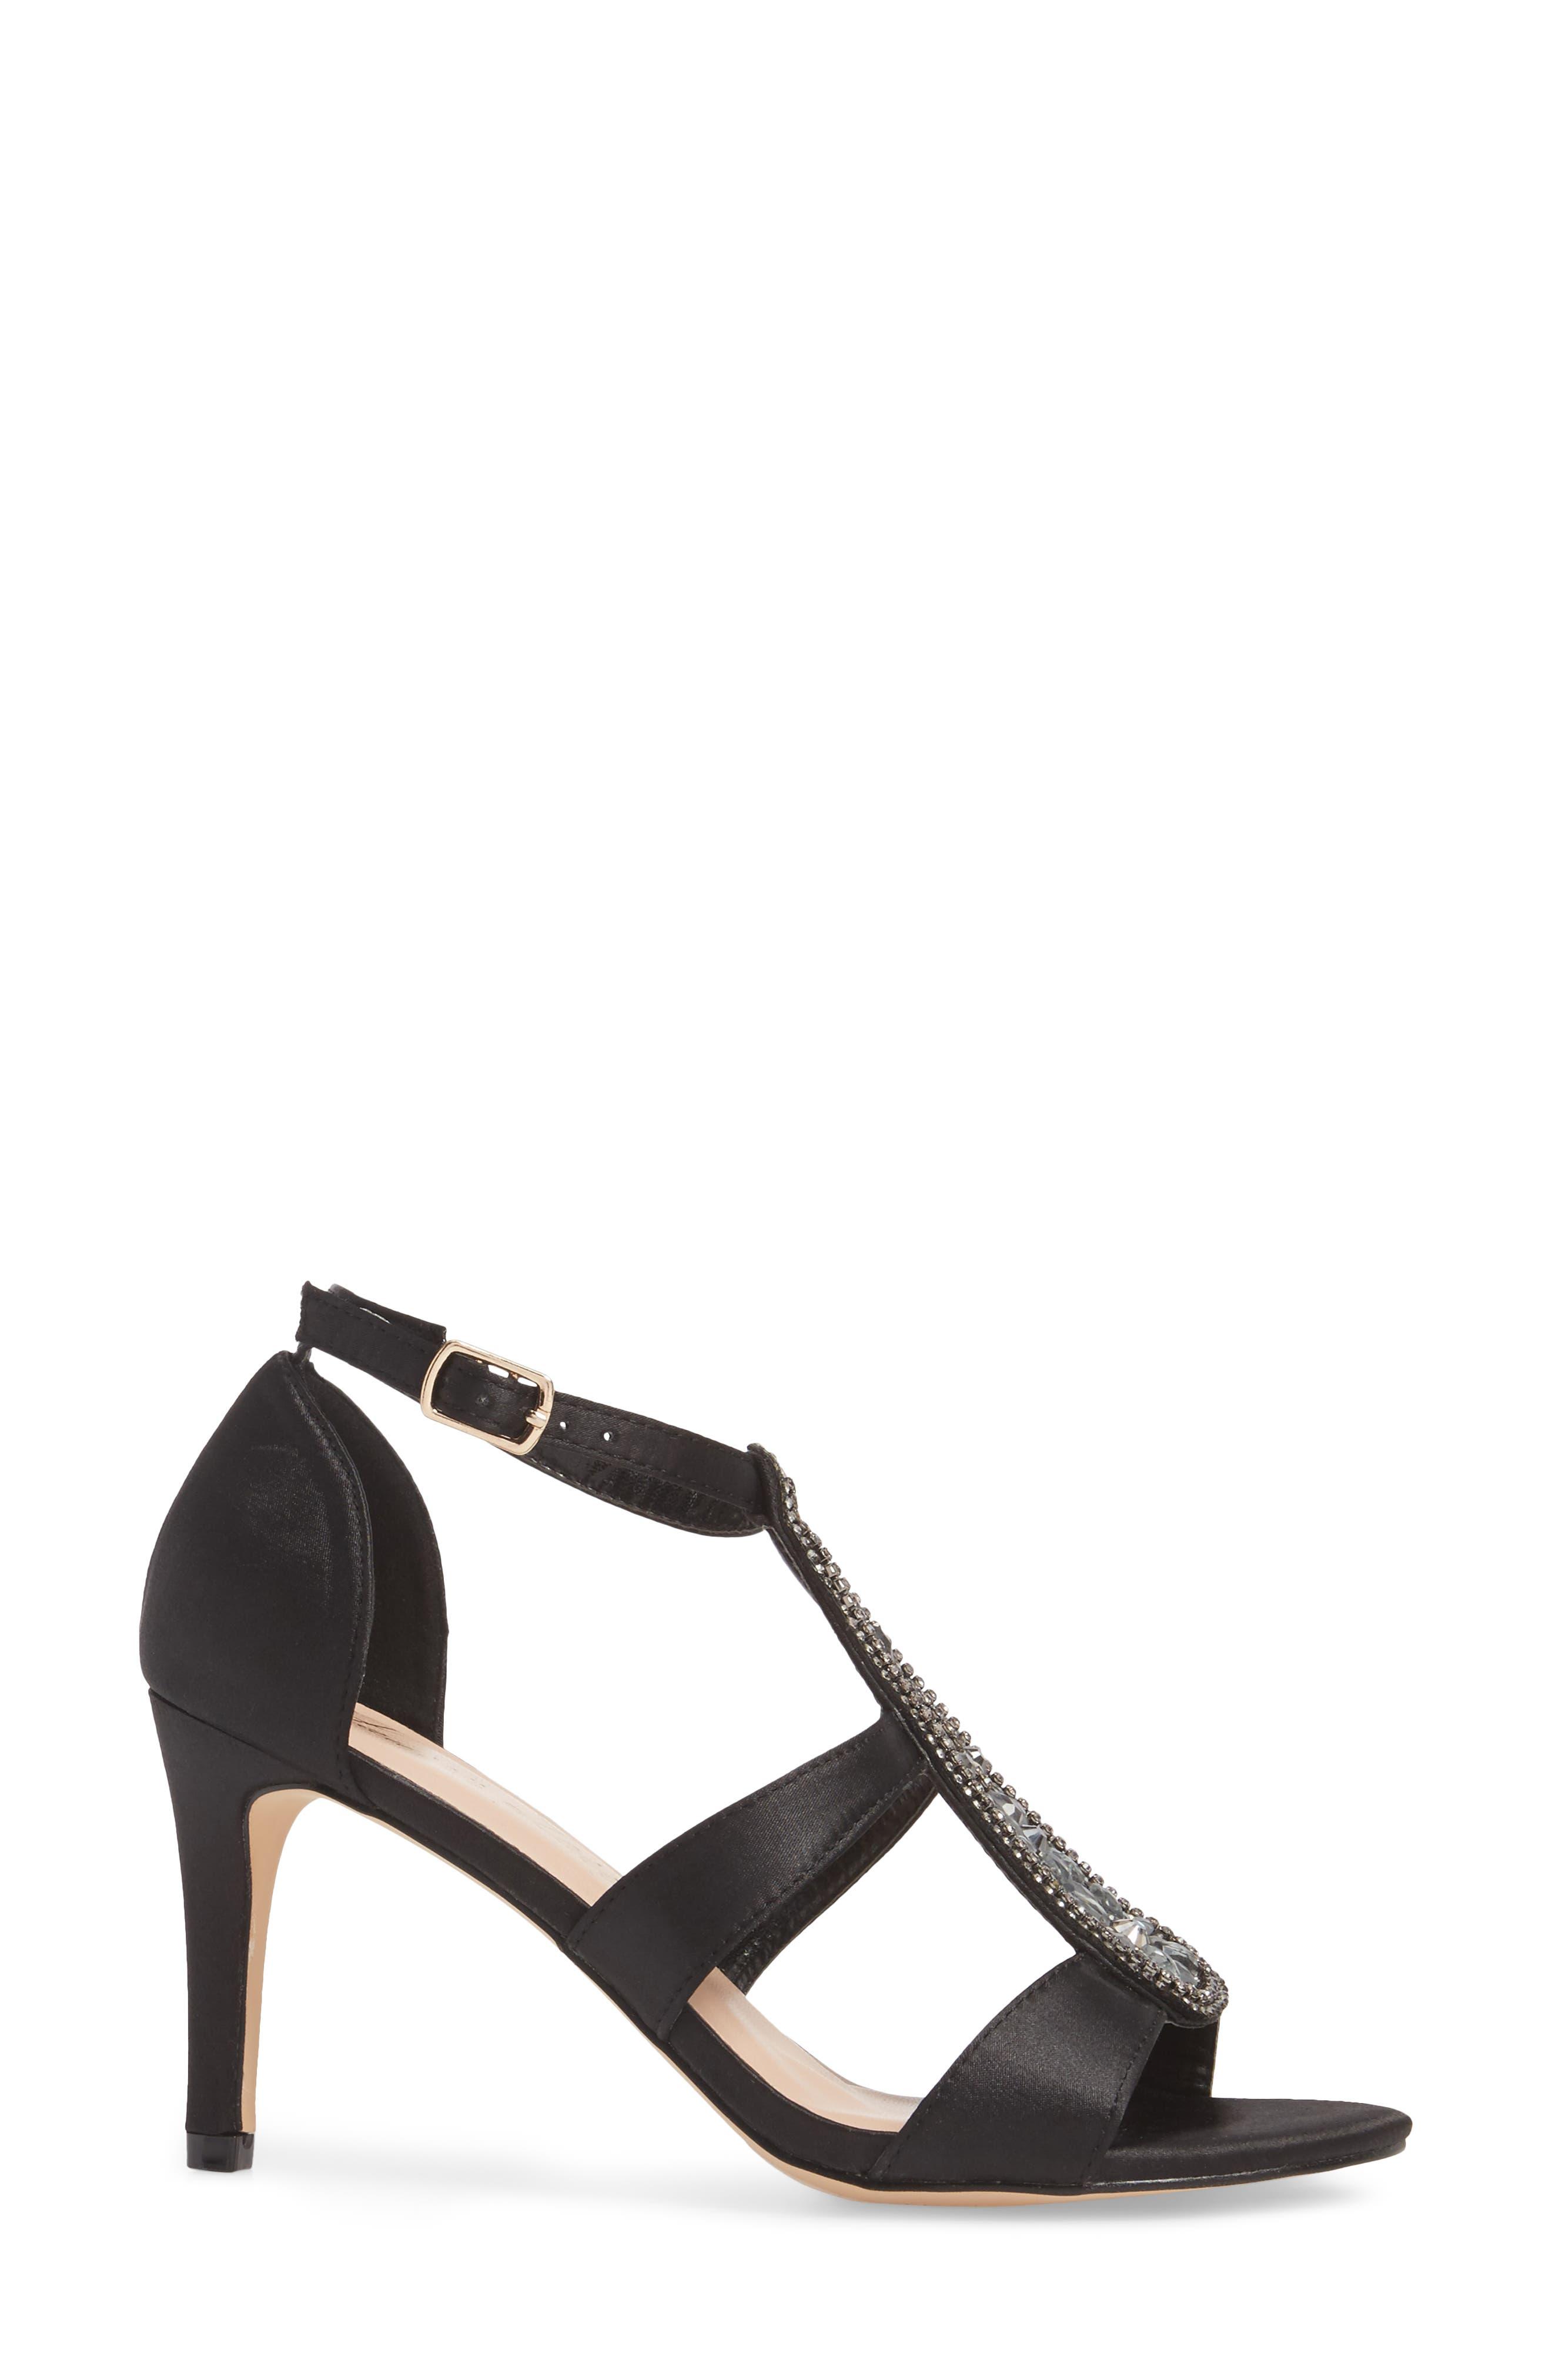 Ritz Crystal Embellished Sandal,                             Alternate thumbnail 3, color,                             BLACK FABRIC